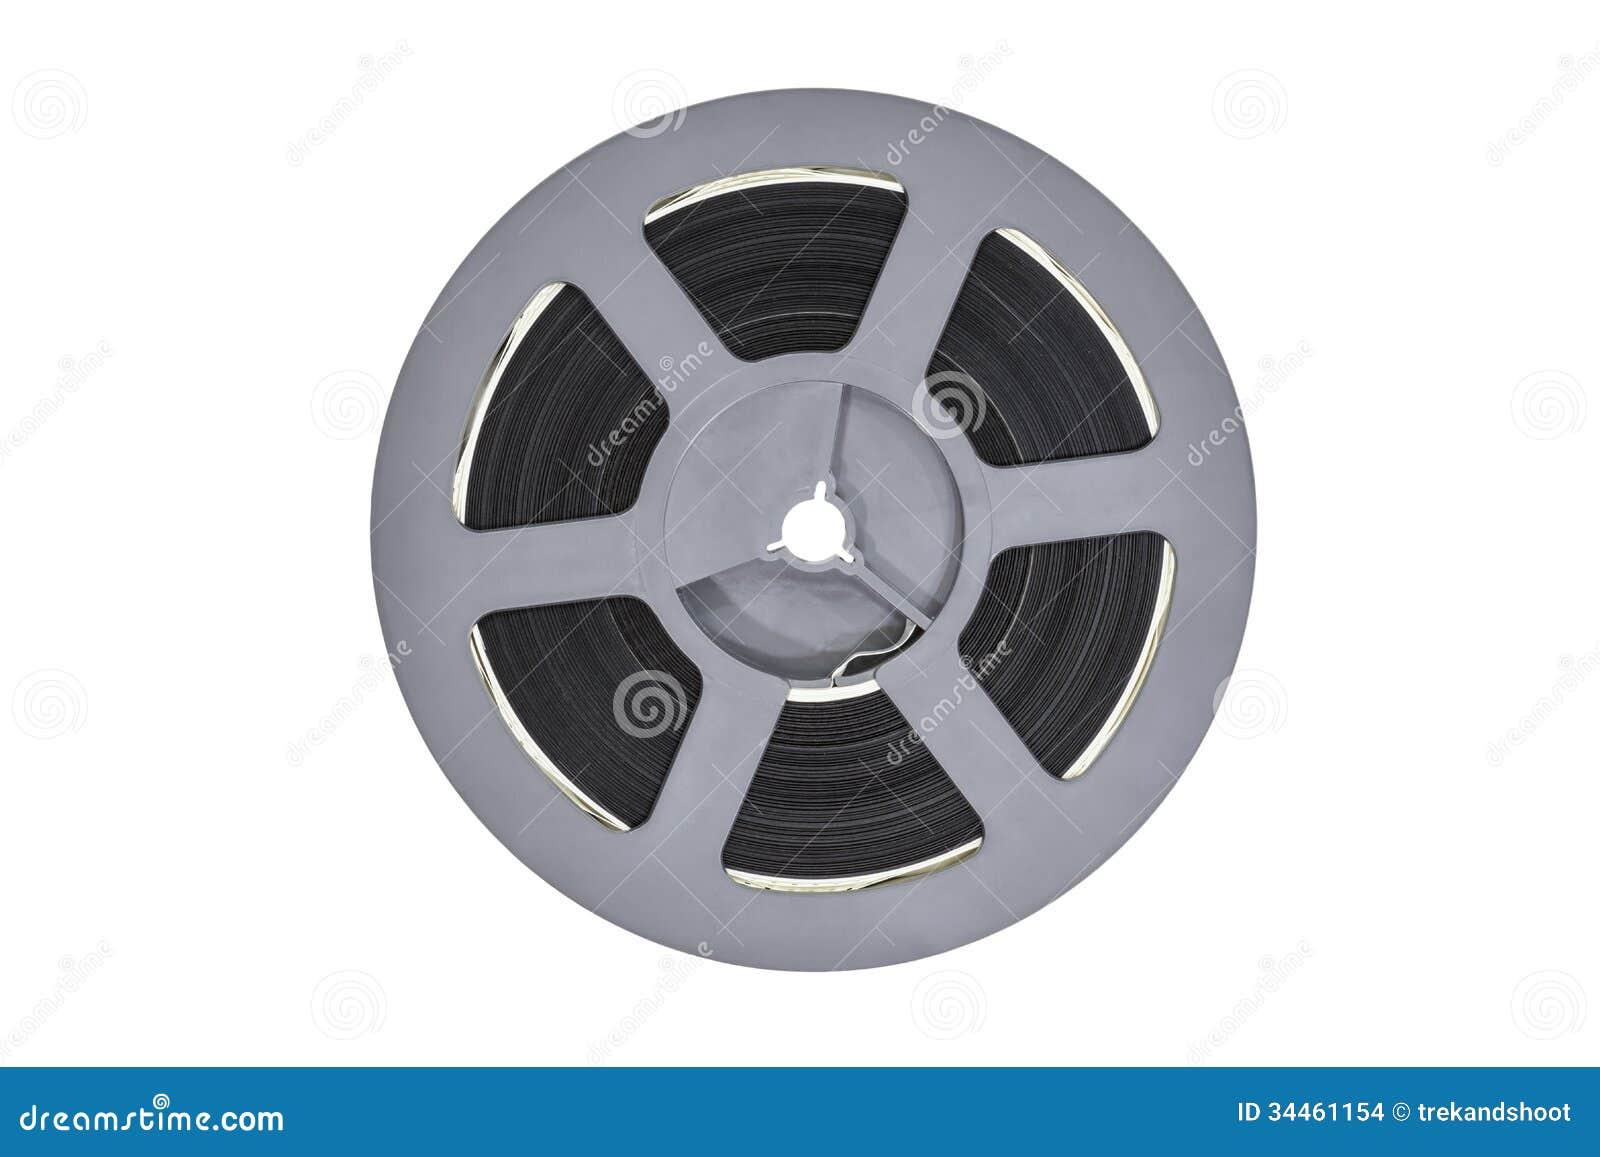 Download Vintage Plastic Super 8 Film Reel Stock Photo - Image of roll, antique: 34461154